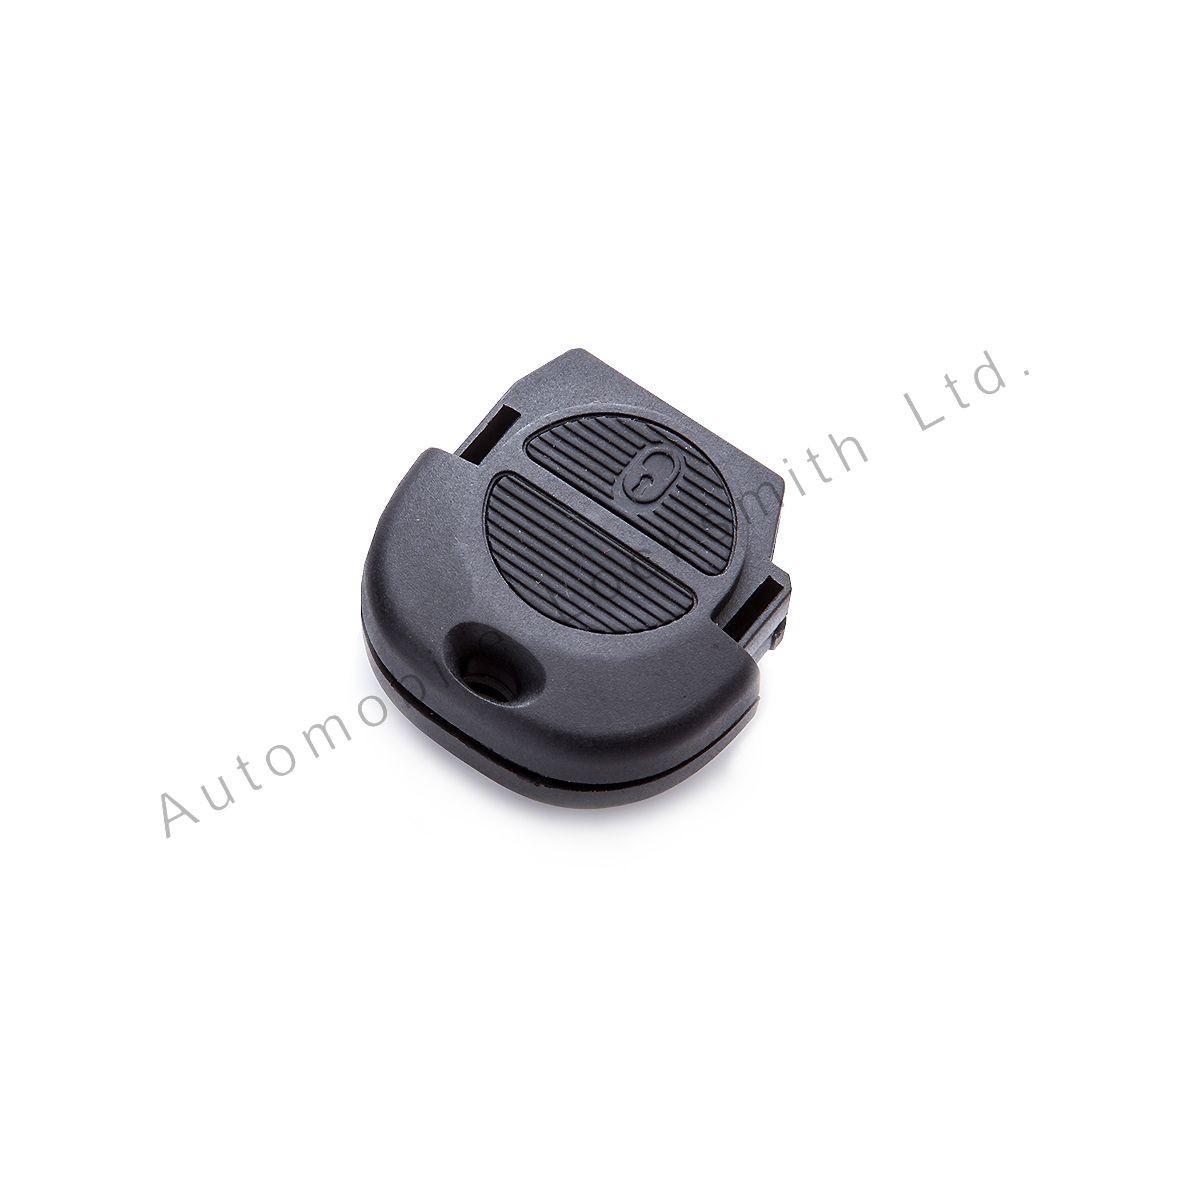 For Nissan Nats Almera Micra X-trail 2 button remote key case shell